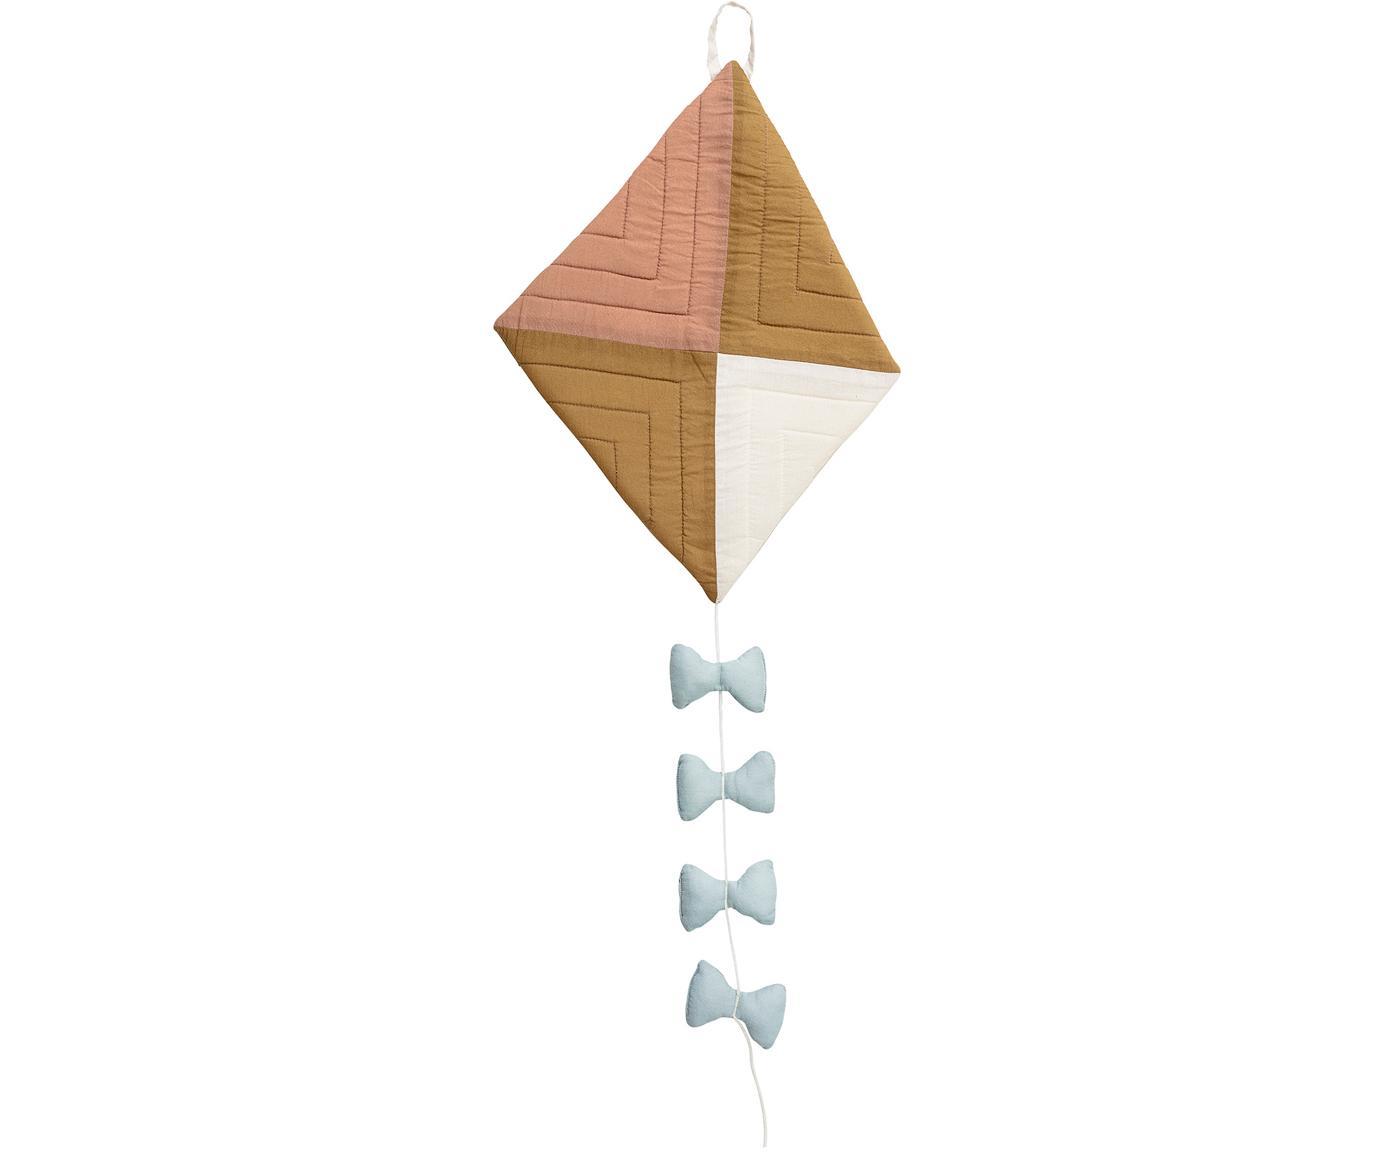 Wandobjekt Kite, Bezug: Baumwolle, Blau, Braun, Creme, 27 x 37 cm